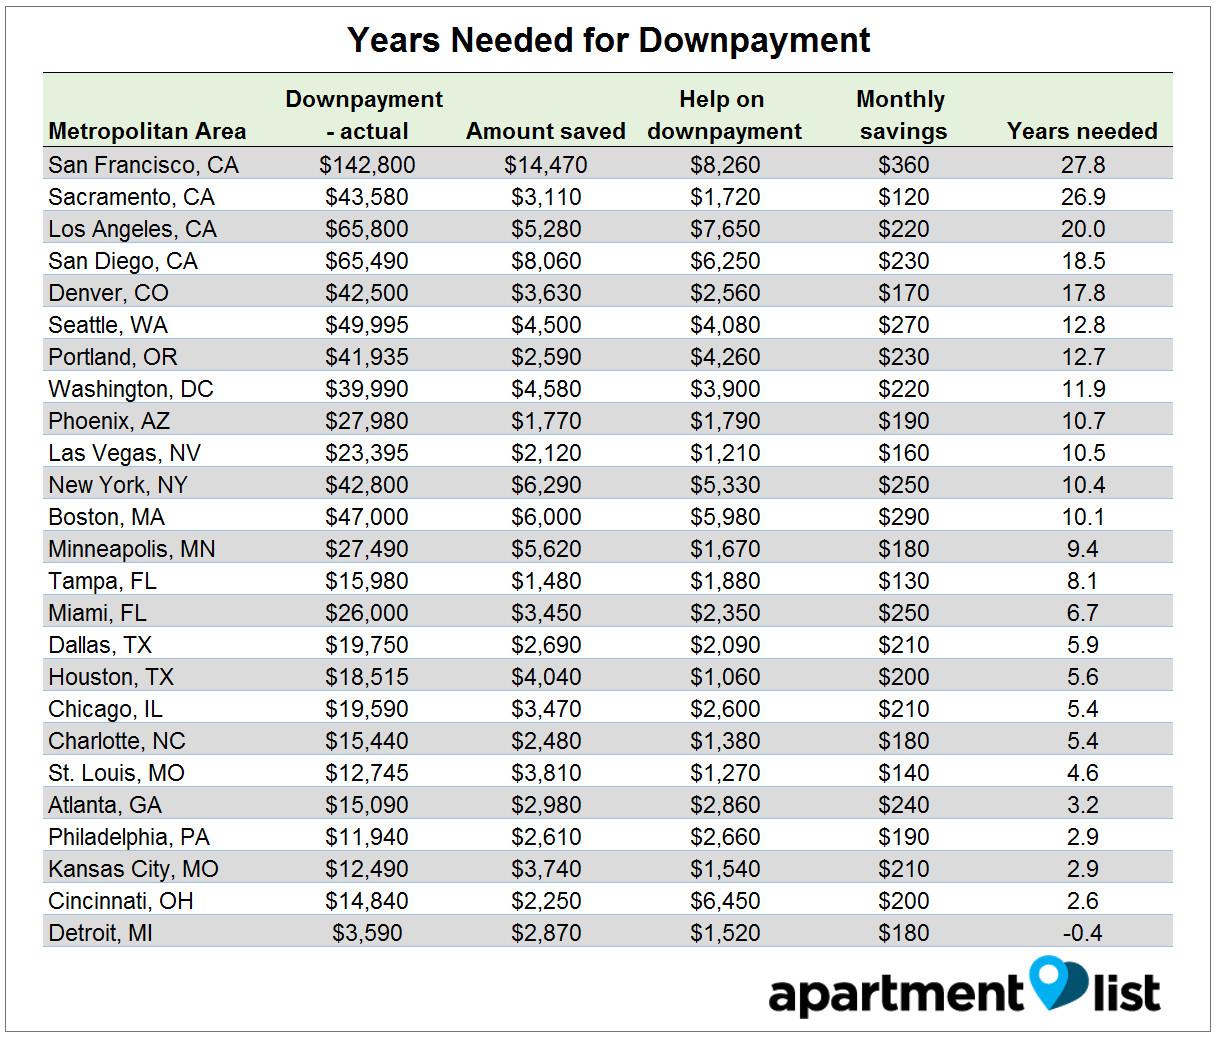 millennial savings homebuying down payment real estate